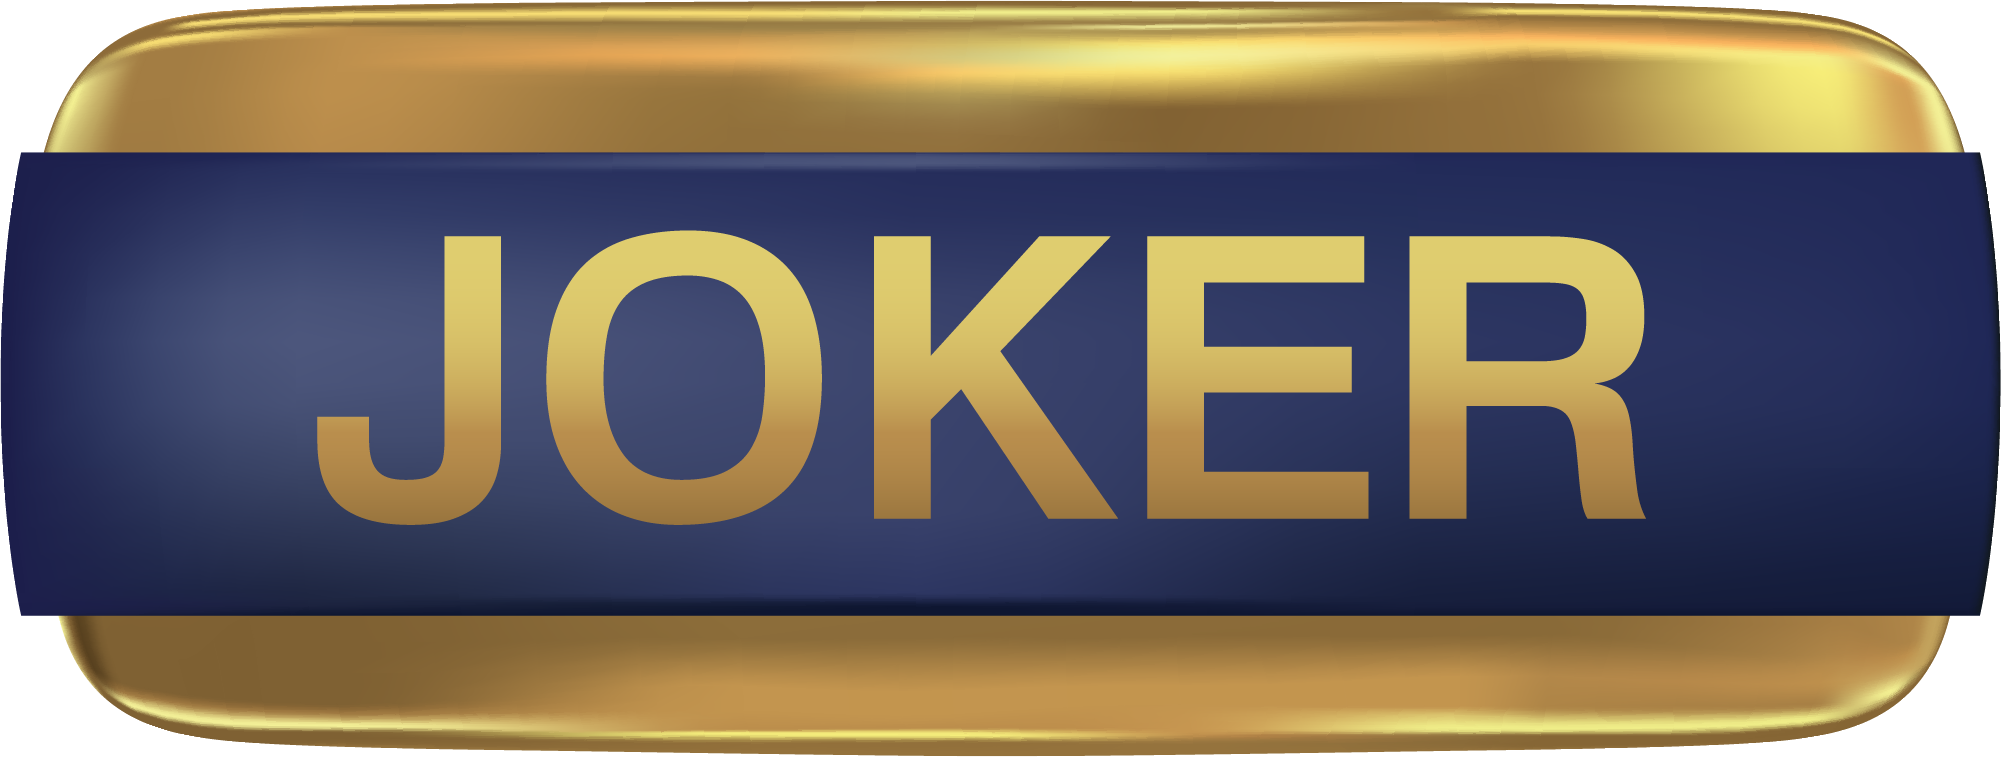 Joker (game show)